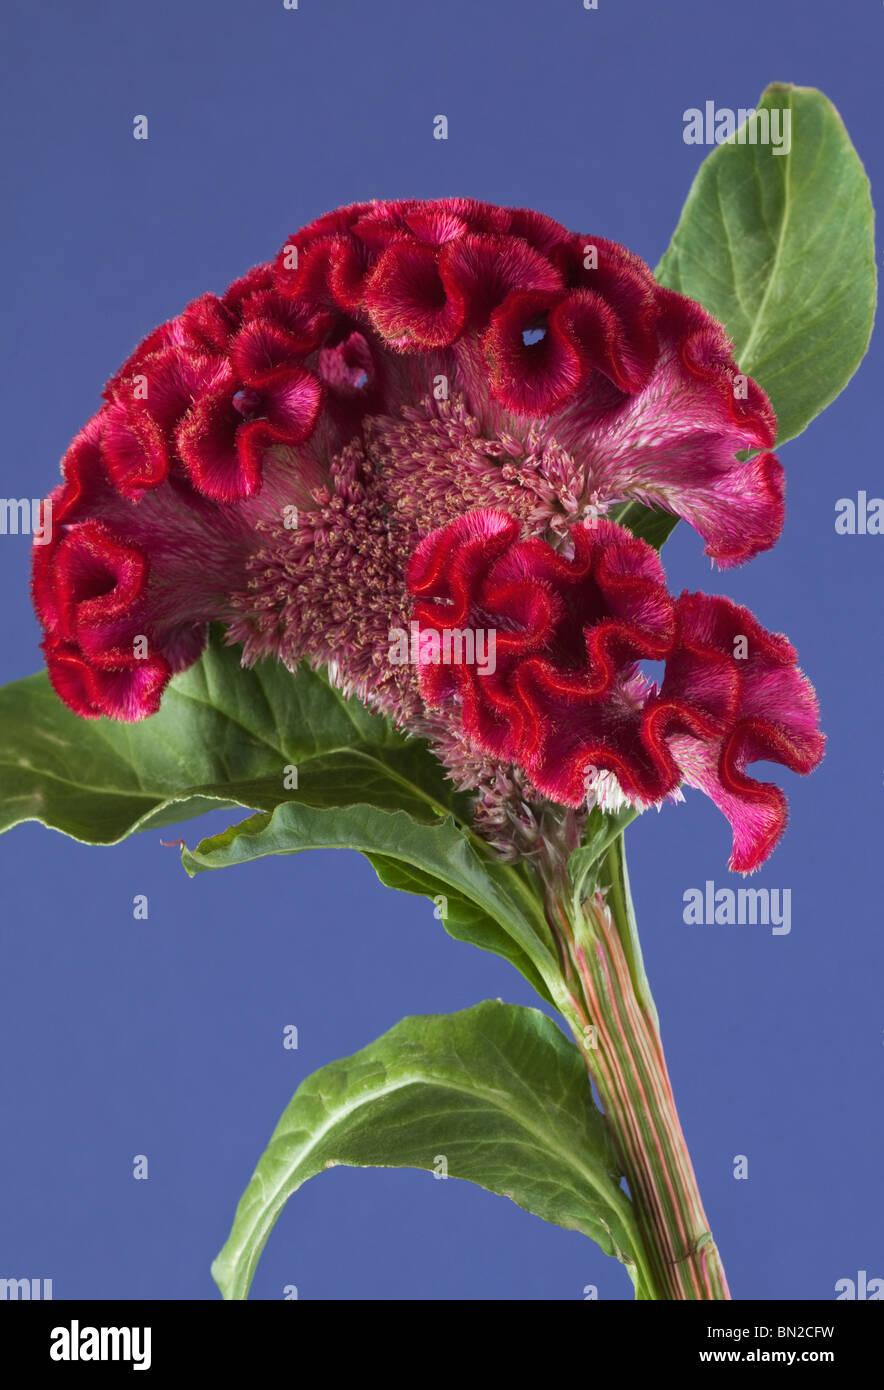 Red Celosia Cockscomb - Stock Image